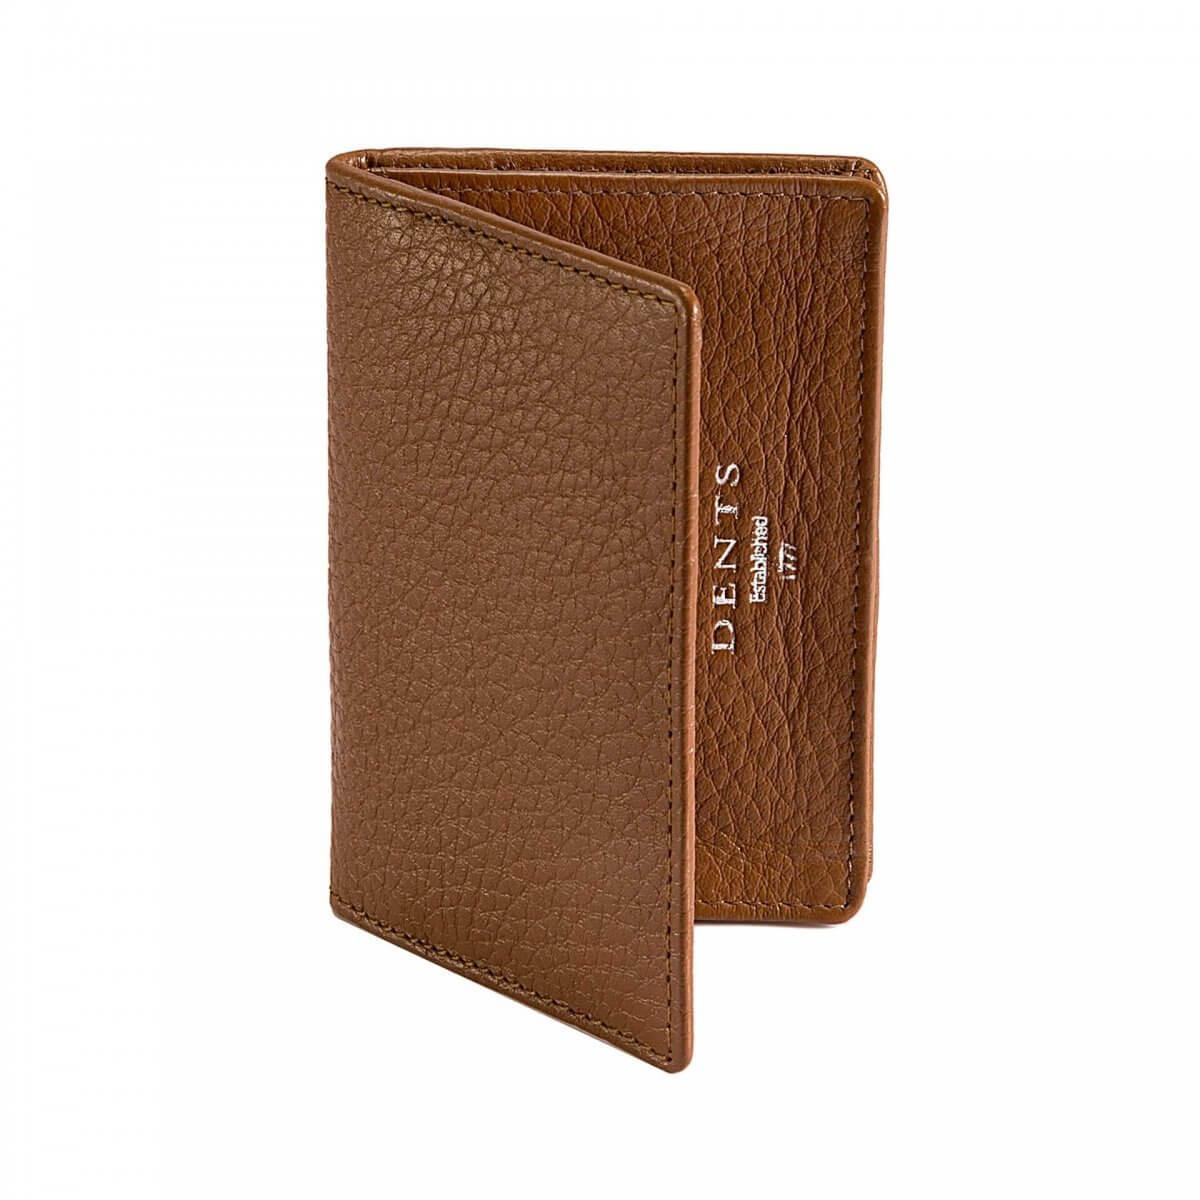 Dents Brown Leather Card Holder